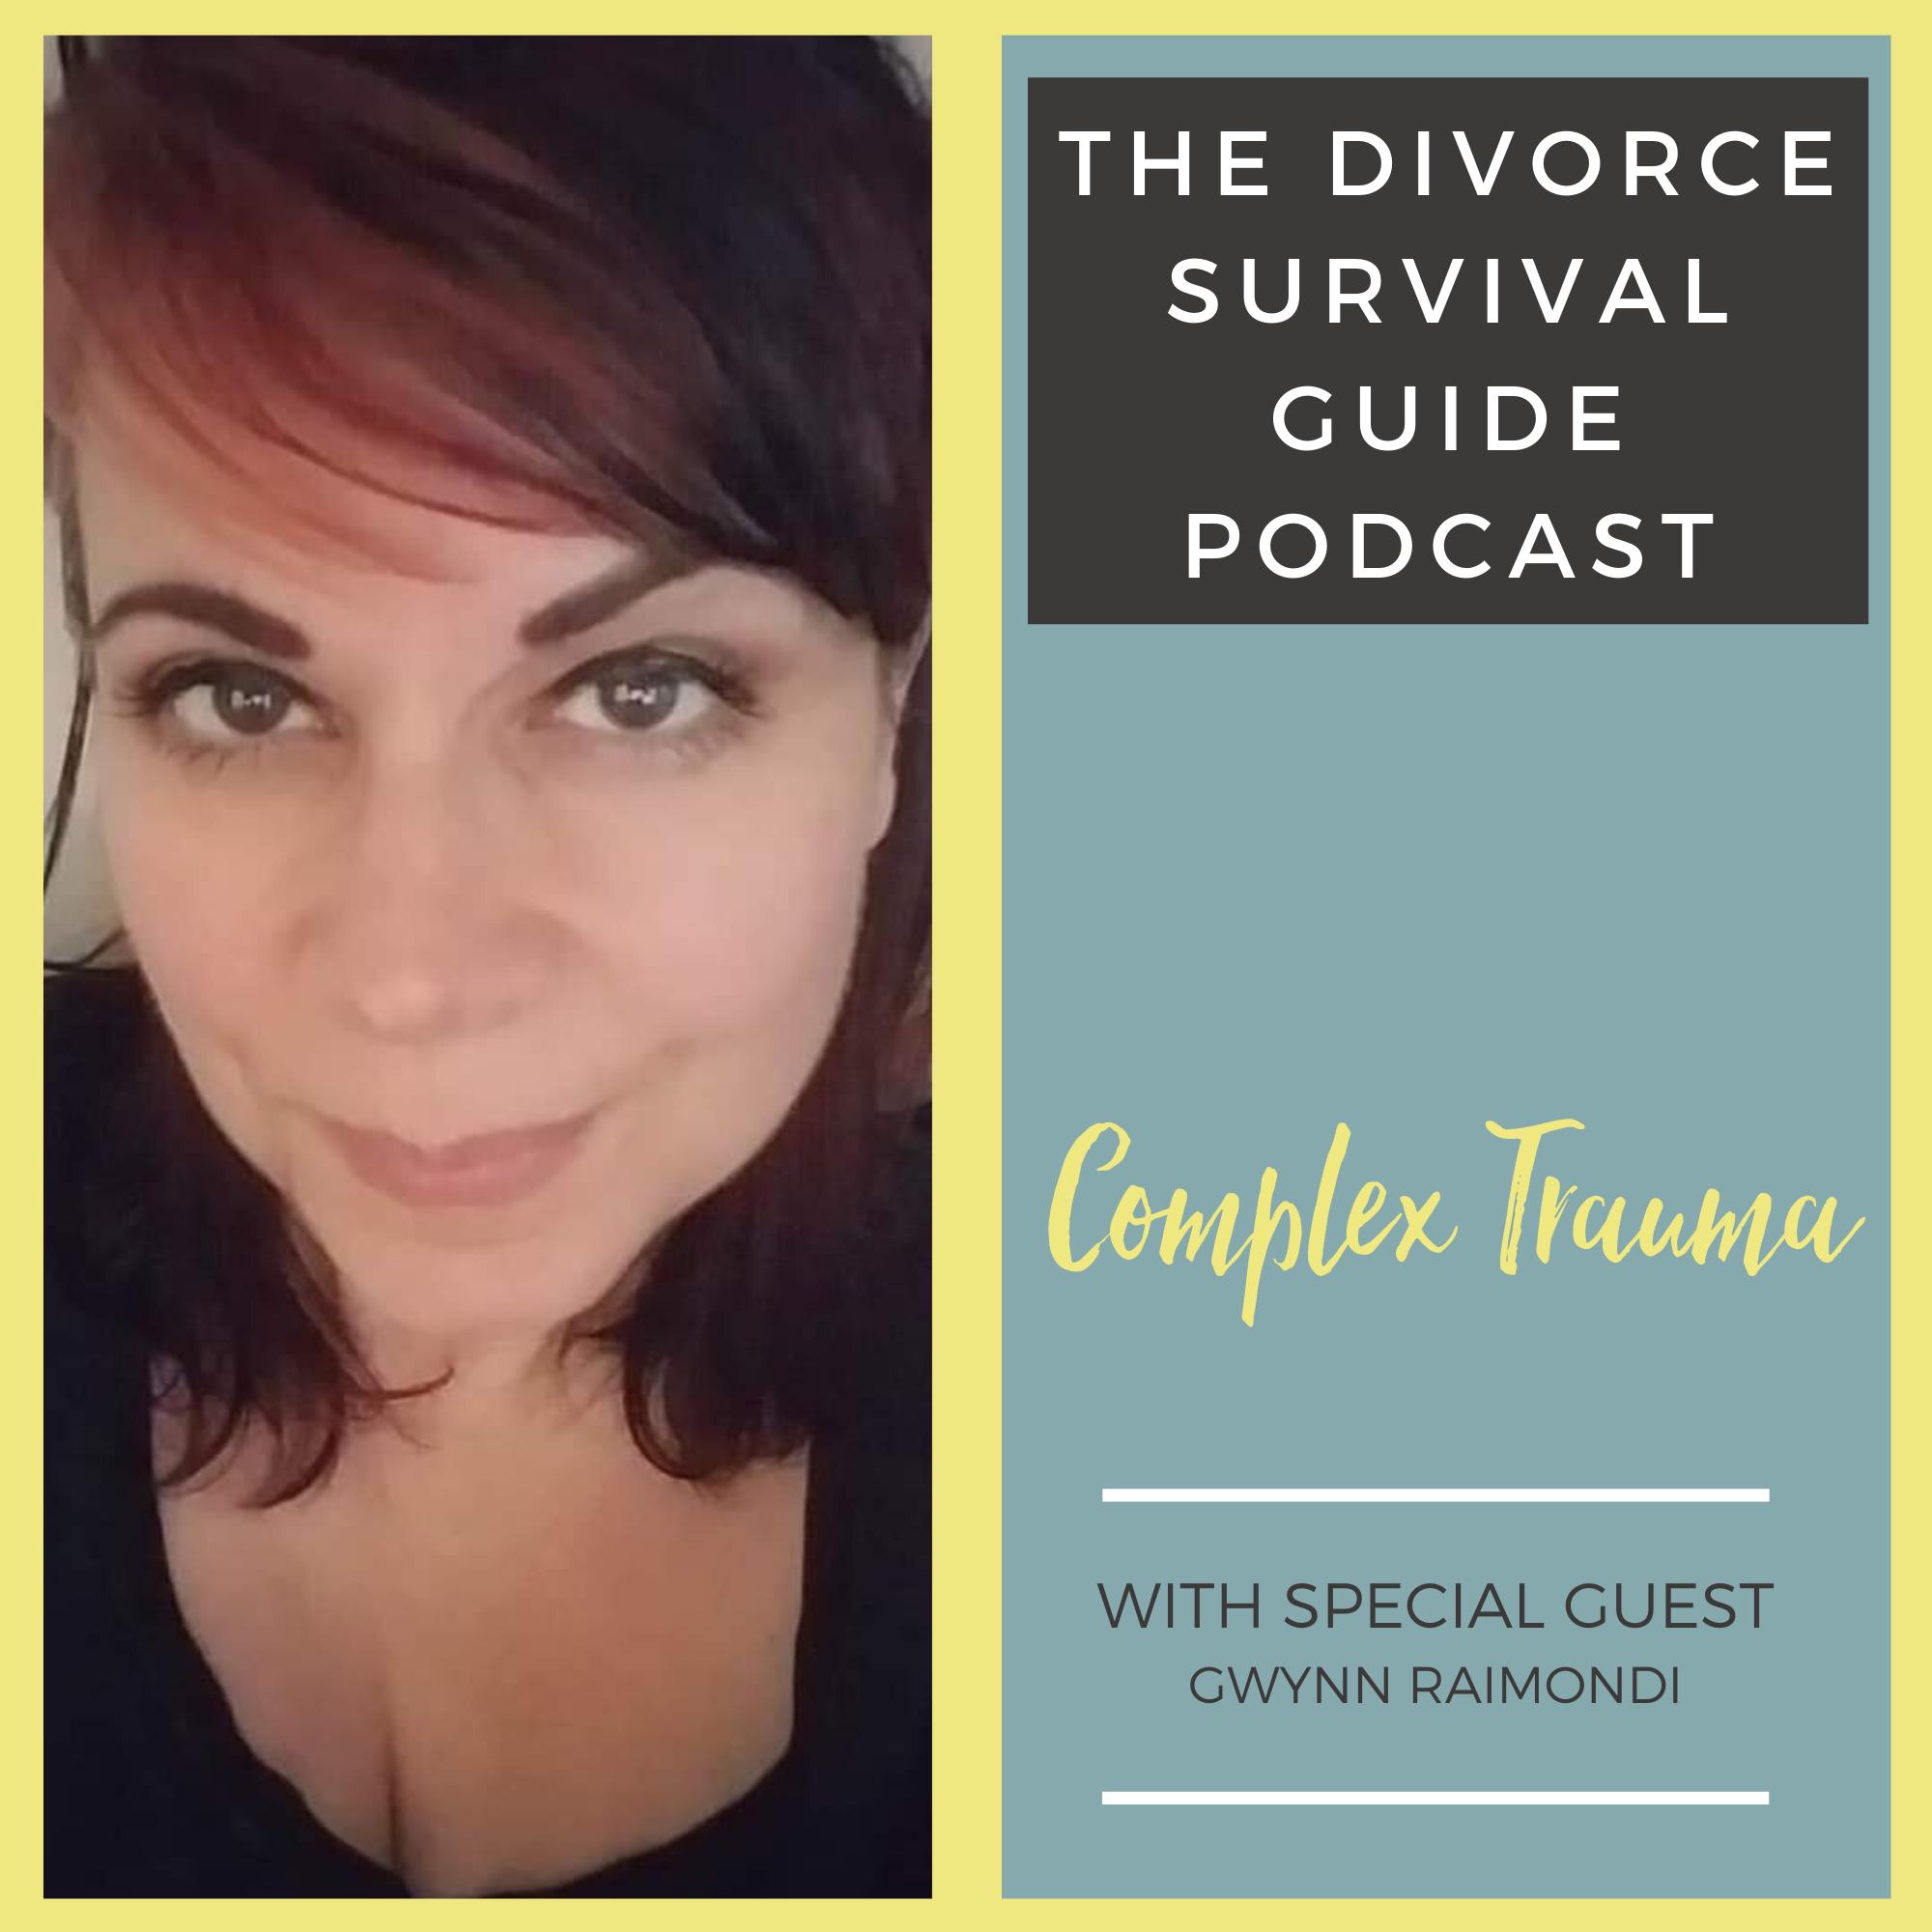 The Divorce Survival Guide Podcast - Complex Trauma with Gwynn Raimondi